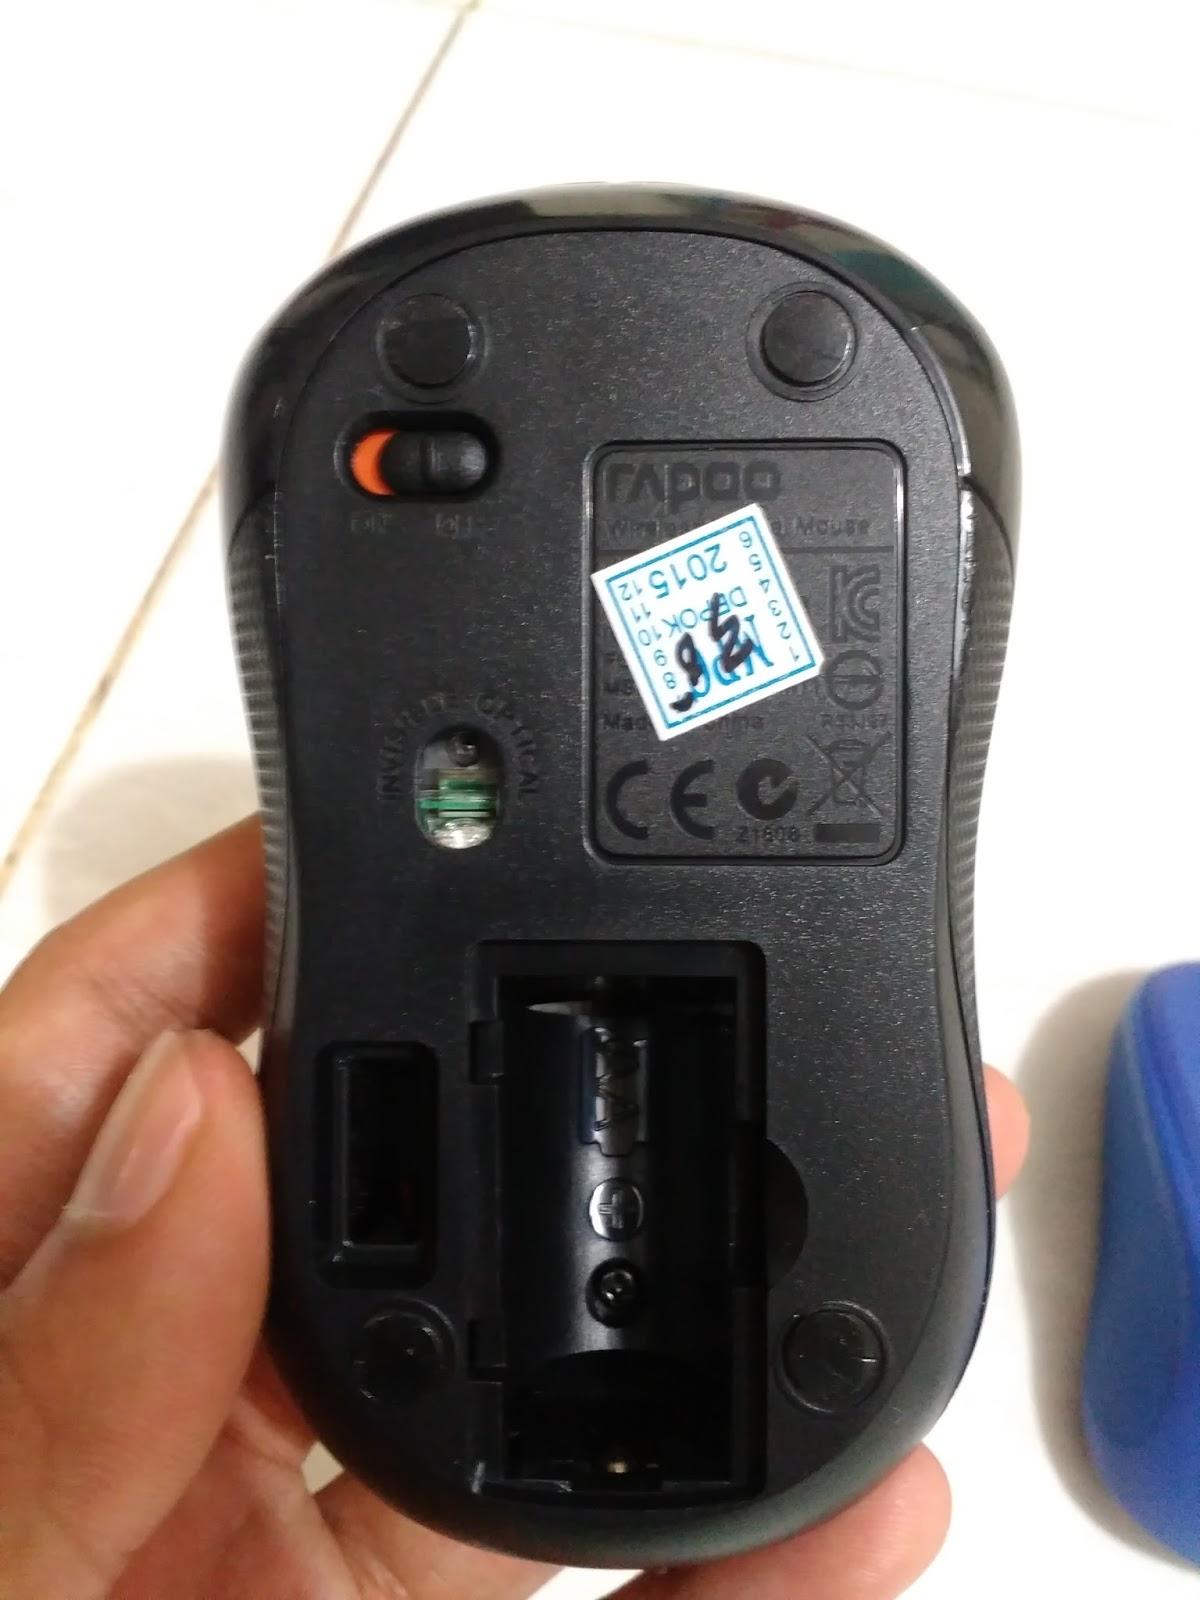 Membandingkan Logitech M235 Dan Rapoo M11 My Timeline Mouse Wireless Sama Menggunakan Sensor Optik 1000 Dpi Maka Peforma Kedua Dalam Menggerakkan Kursor Seimbang Tetapi Dengan Software Khusus Dari